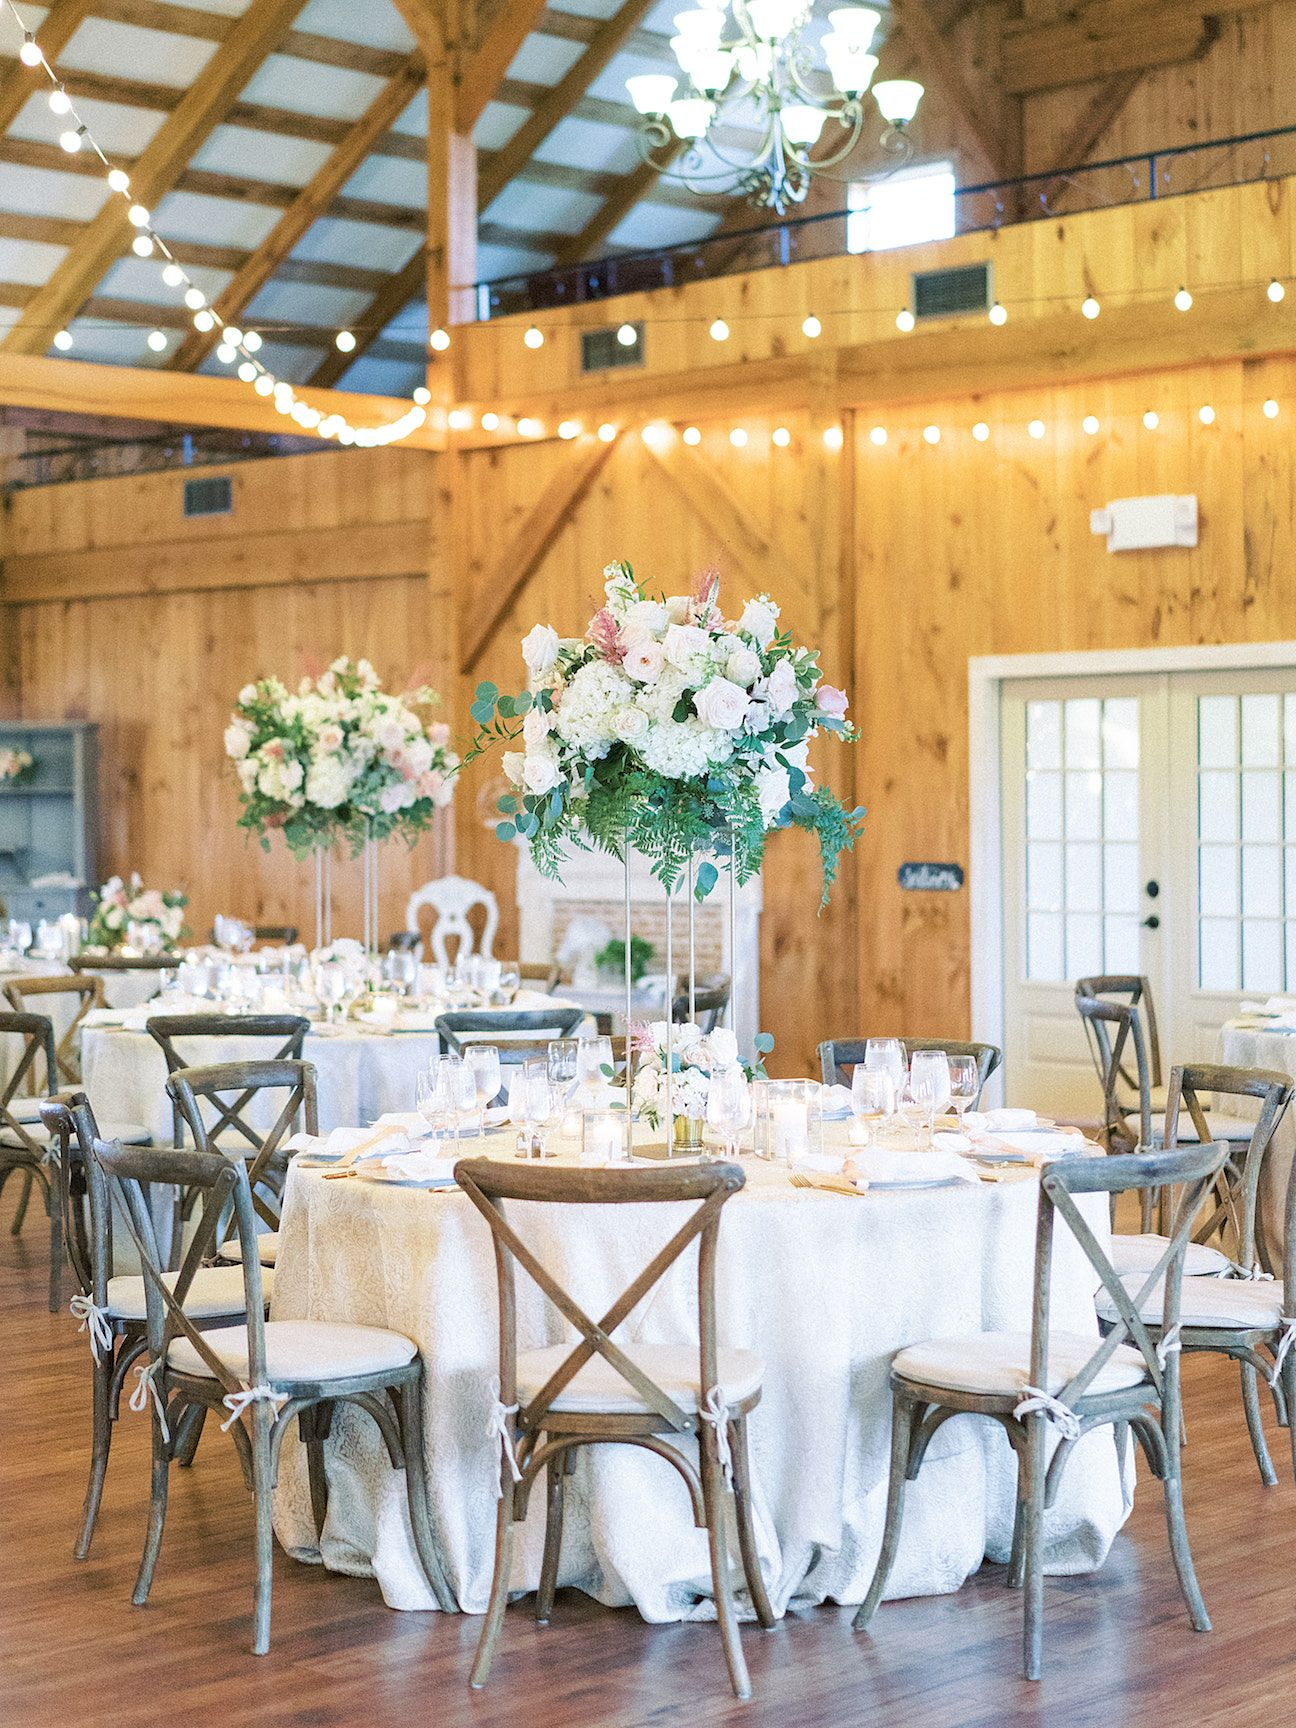 Adam + Lauren | Barn wedding venue, Barn wedding, Wedding ...